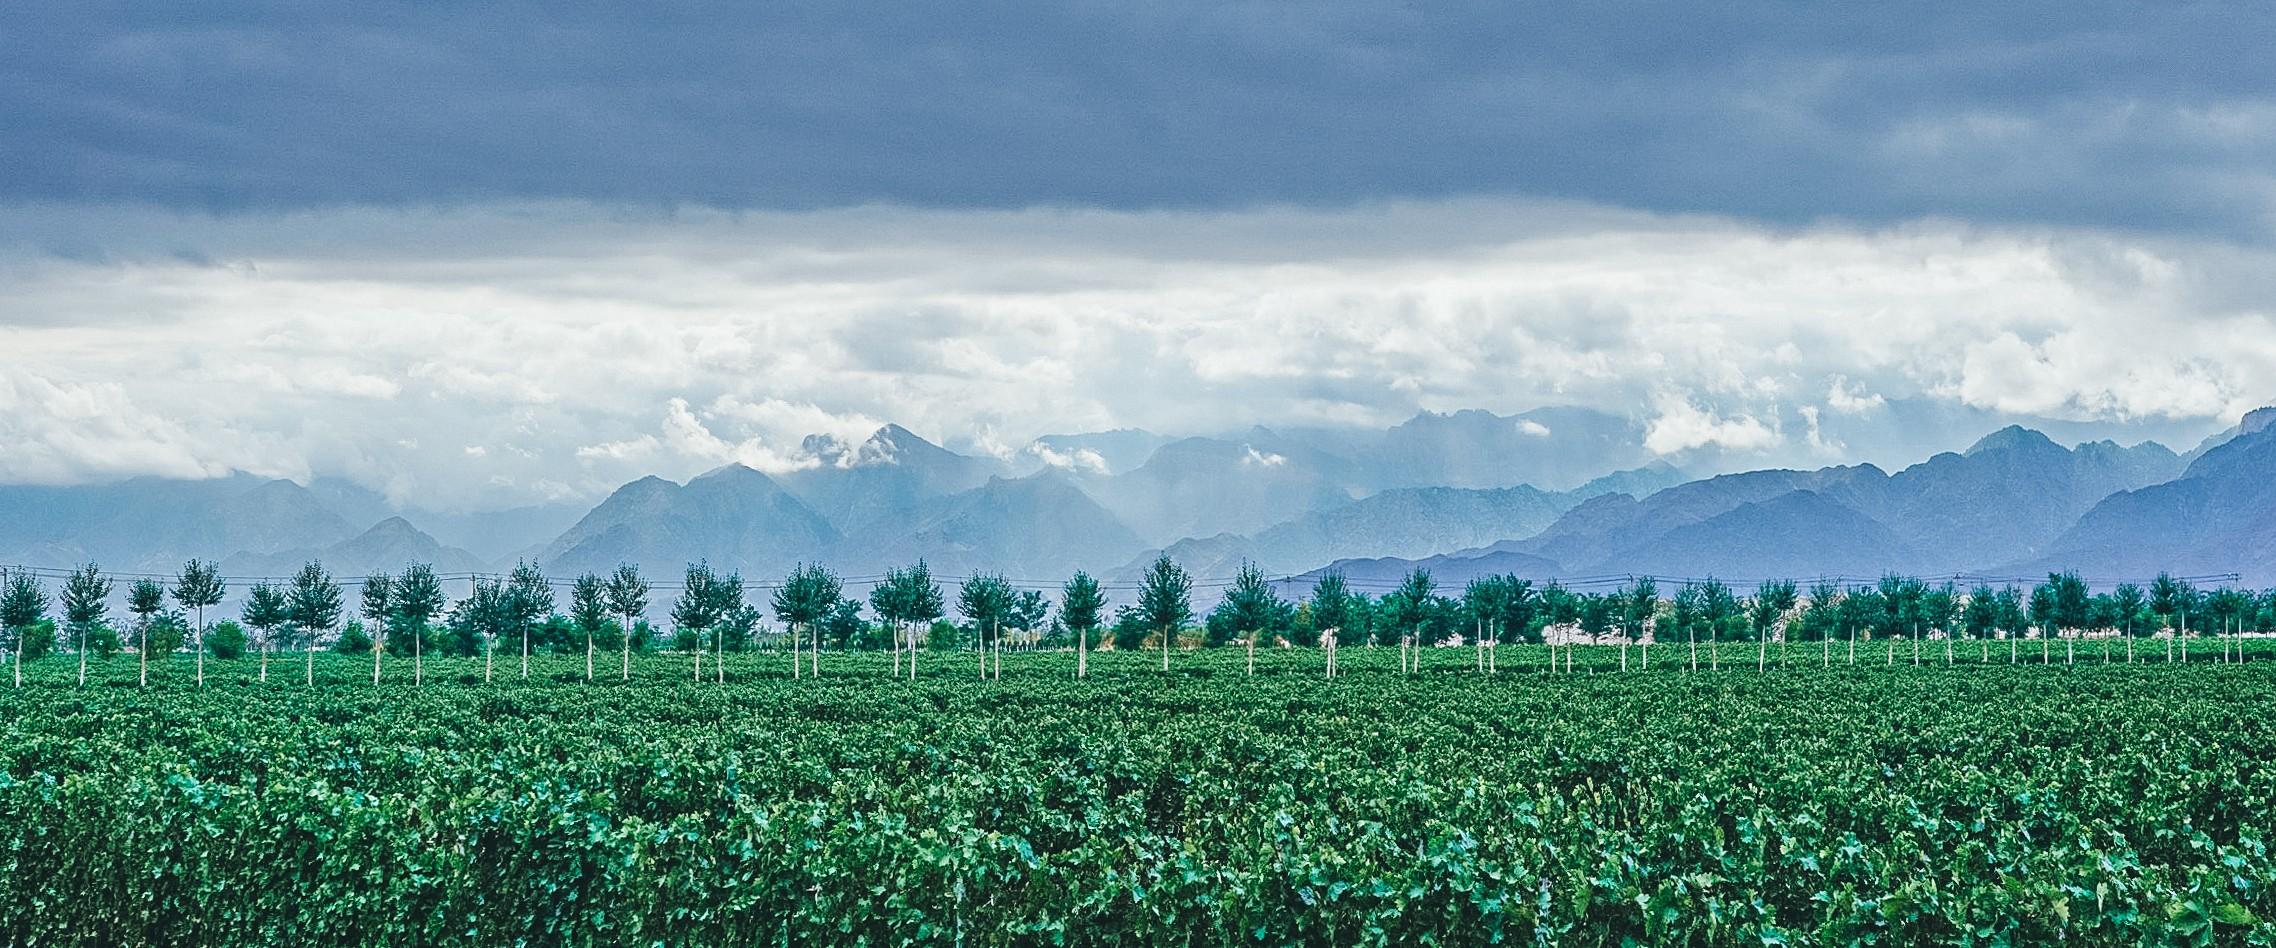 Chinese winery Jade Vineyard in Ningxia